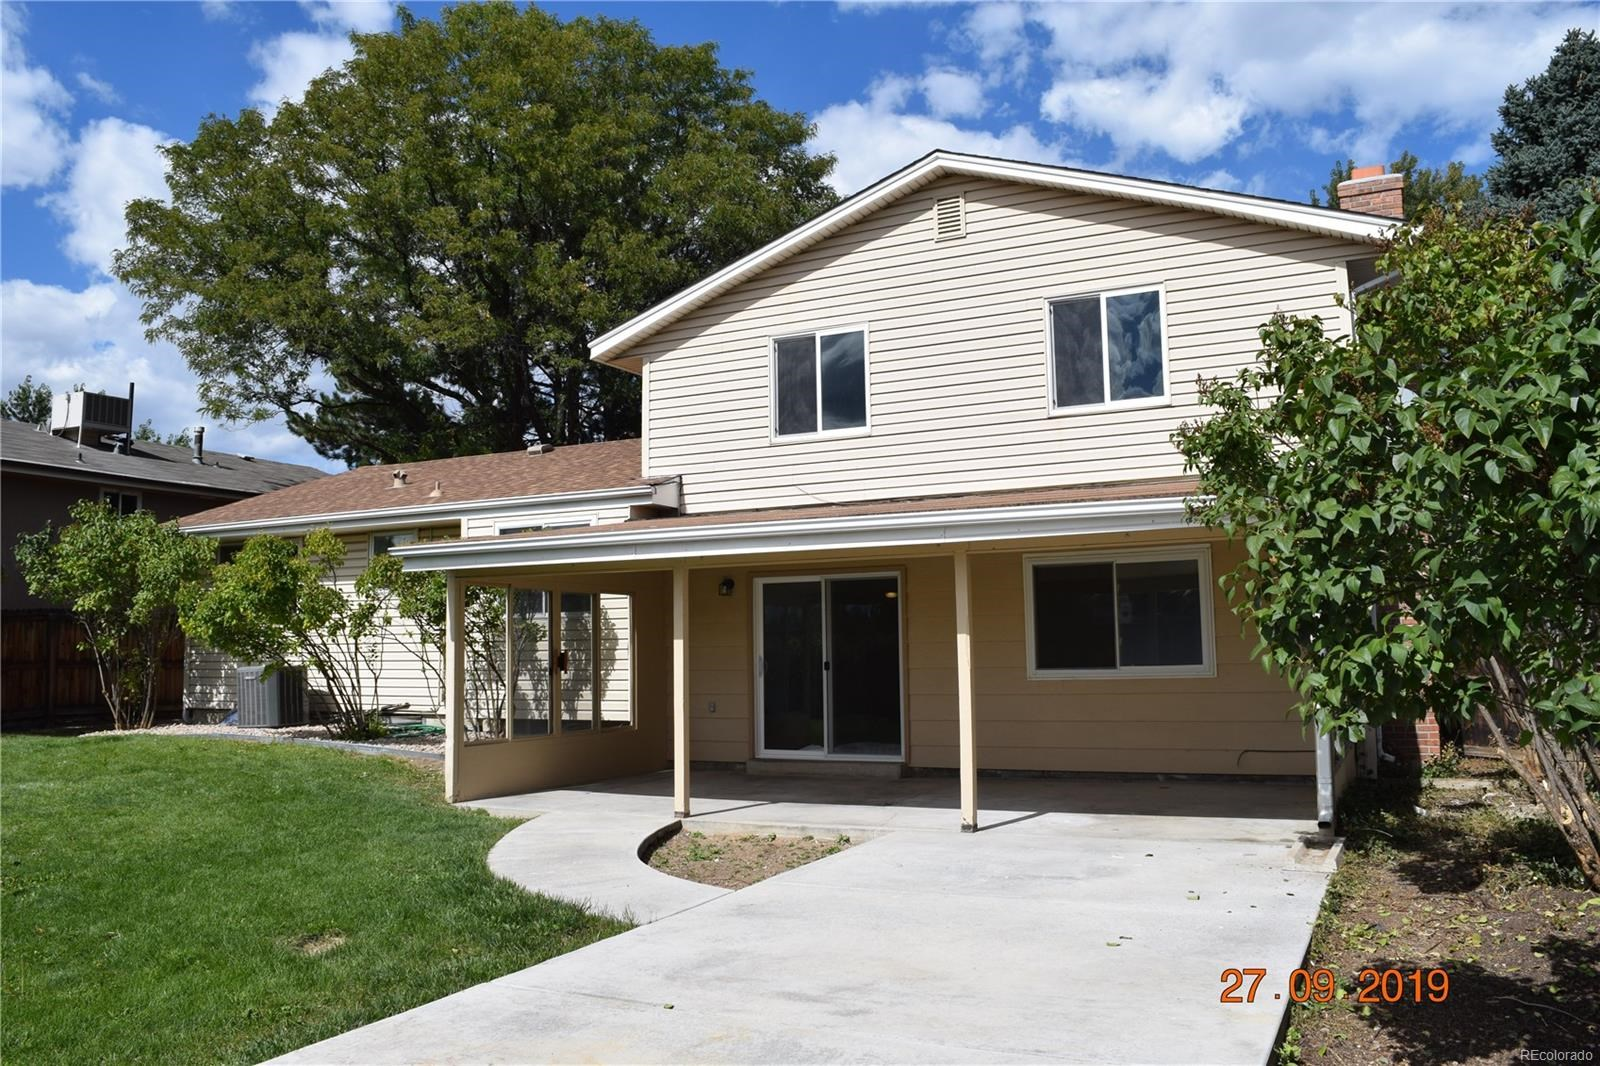 MLS# 9616472 - 3 - 8026 W Calhoun Place, Littleton, CO 80123